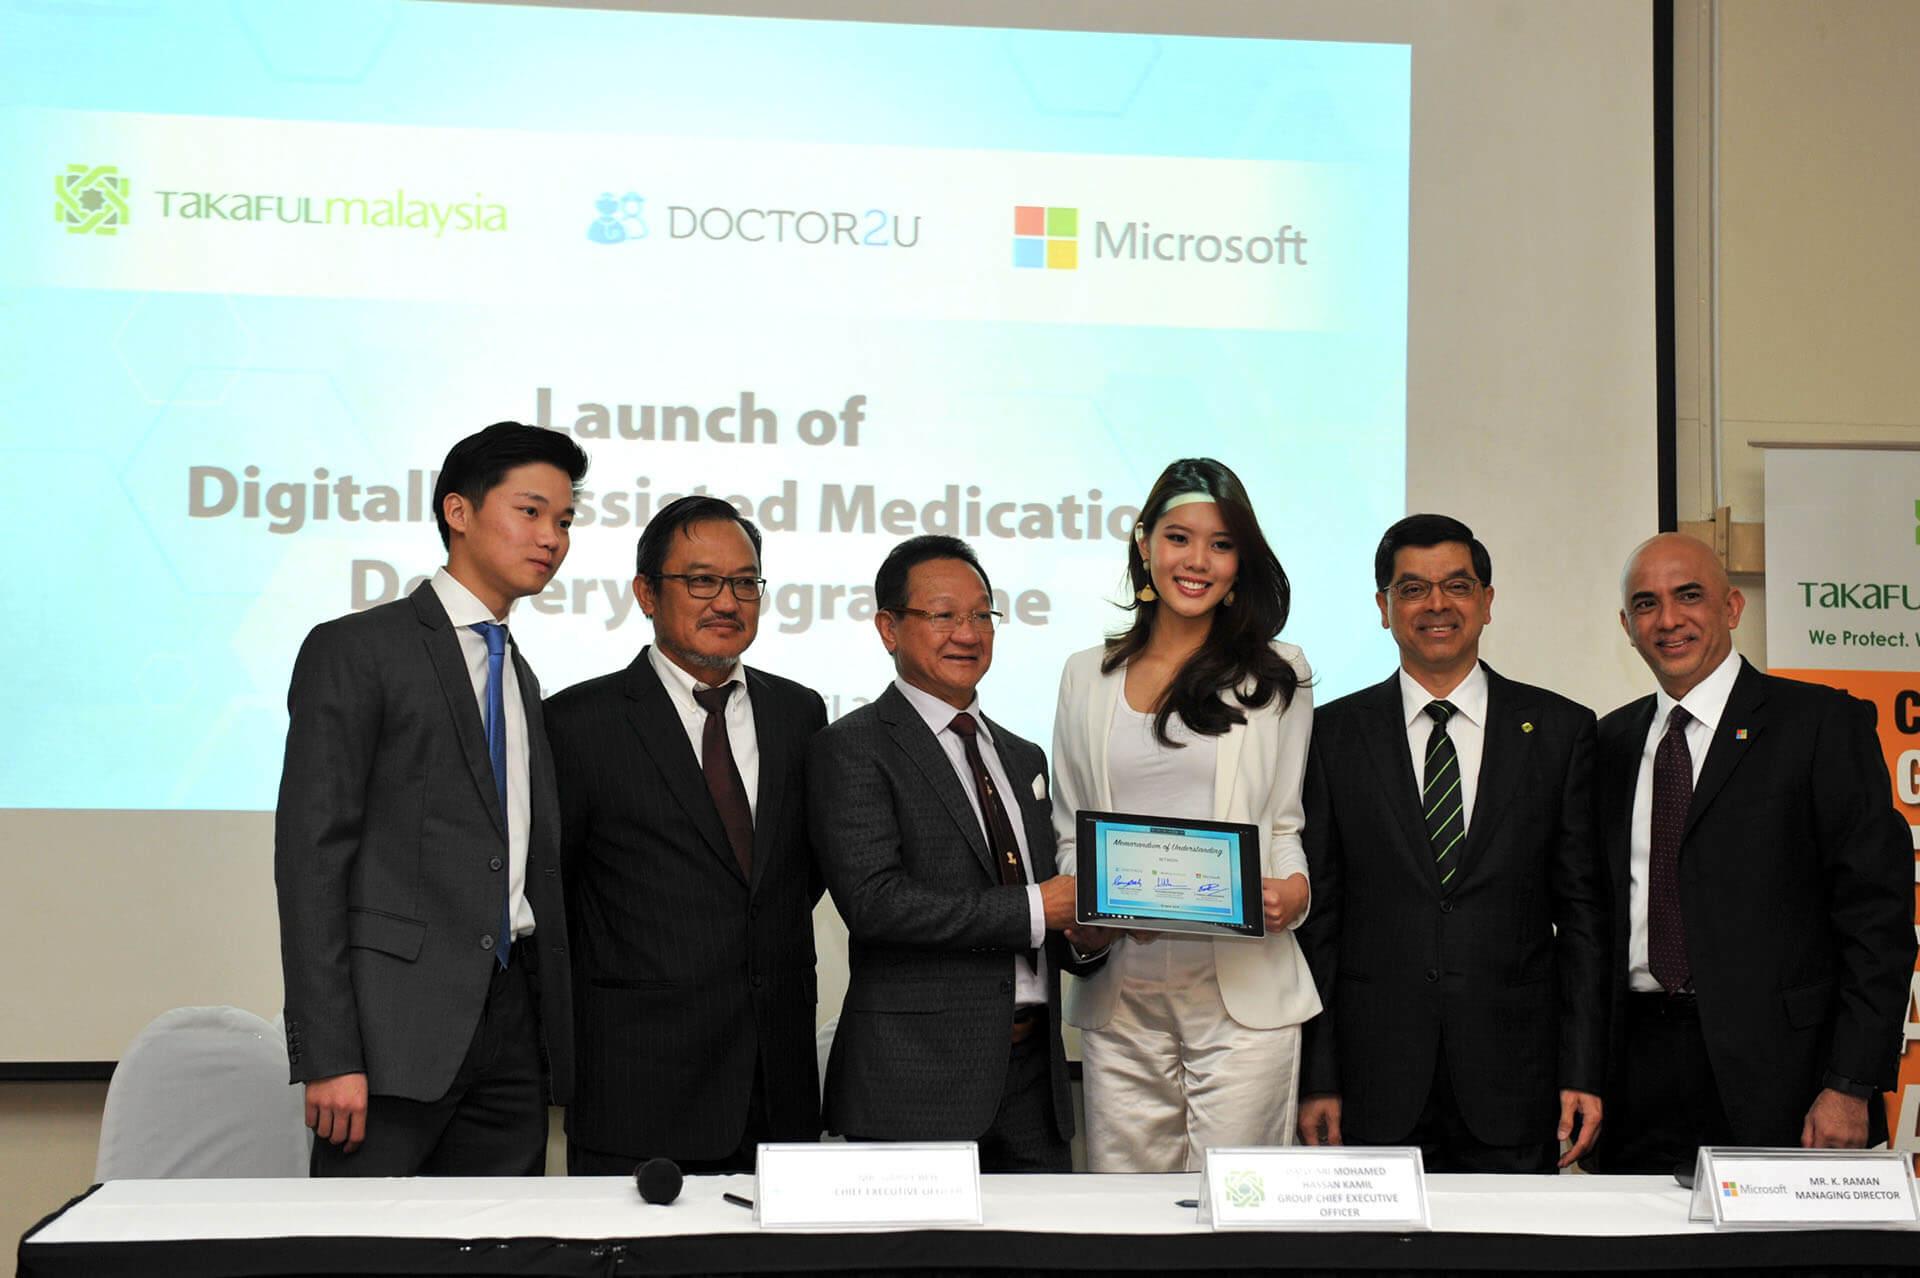 Takaful Malaysia, Doctor2U and Microsoft signs a joint partnership